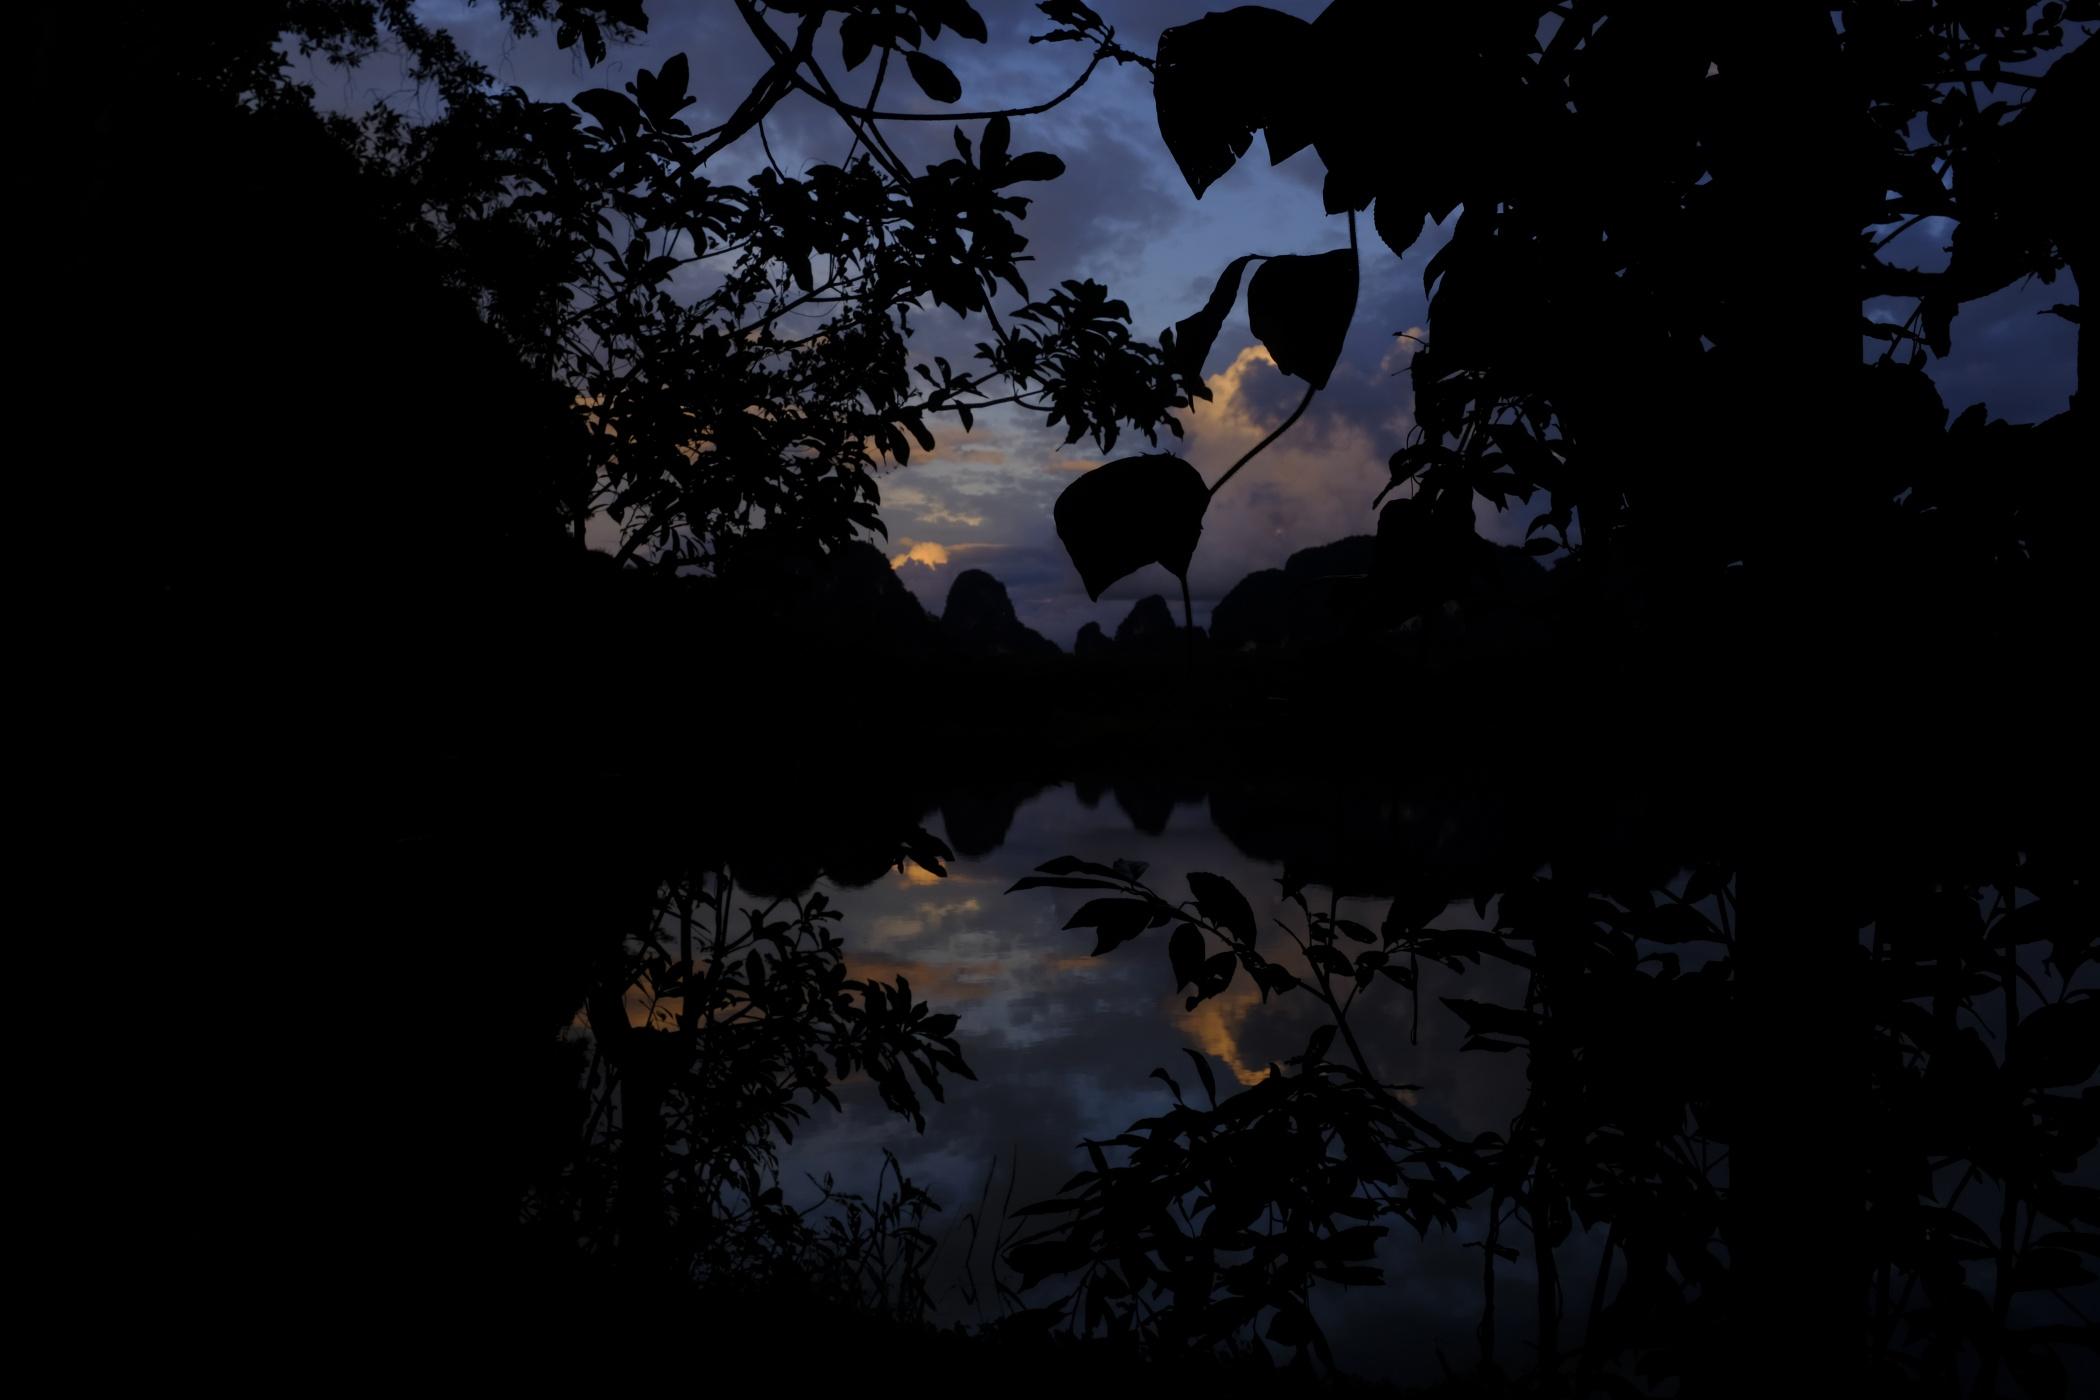 Introduction - Carlos Ramiro Photography